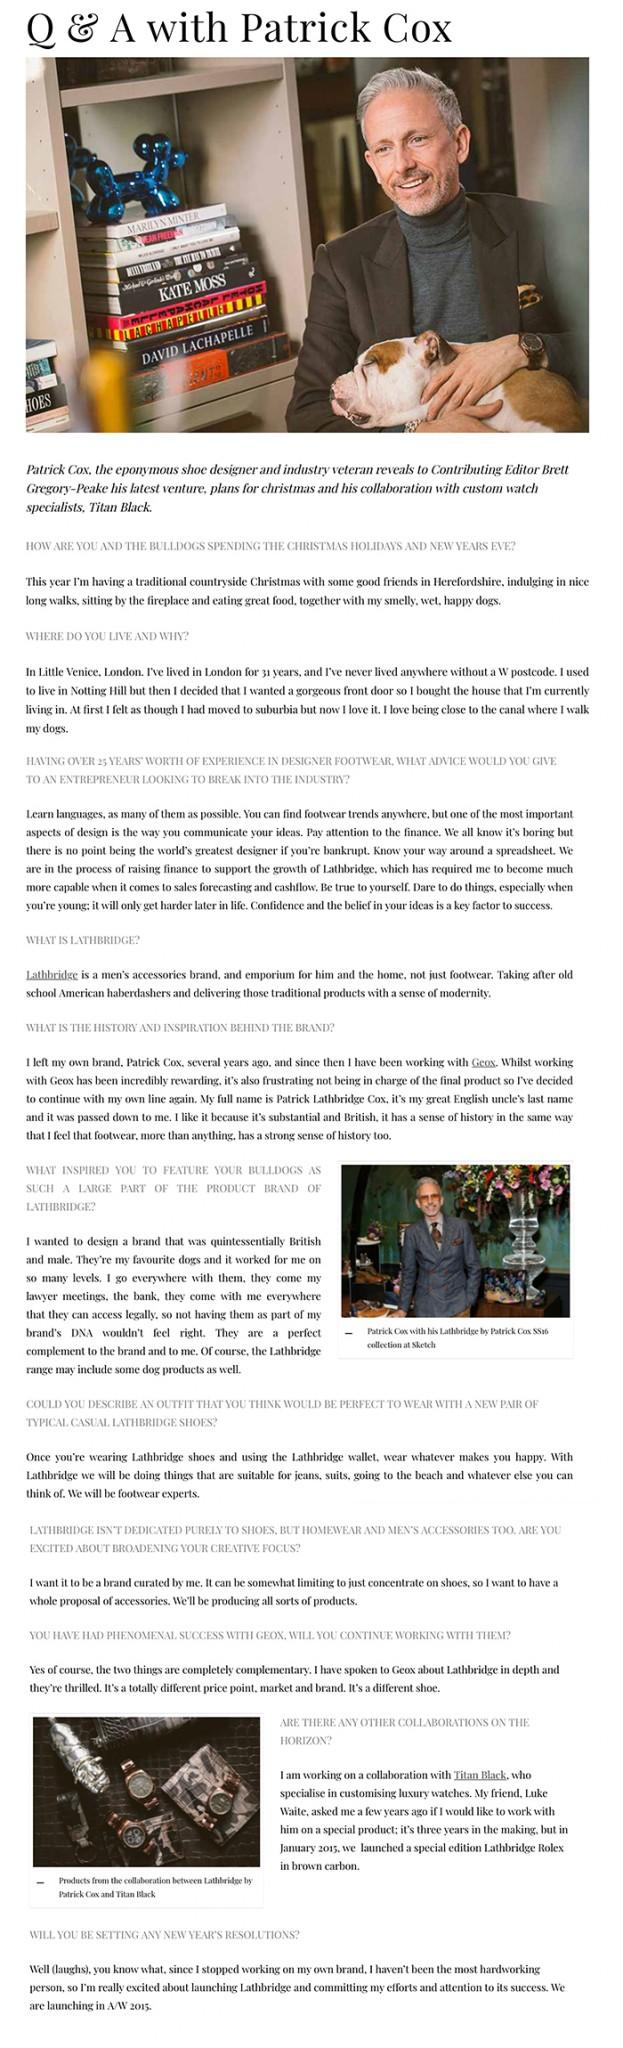 article_unity.jpg